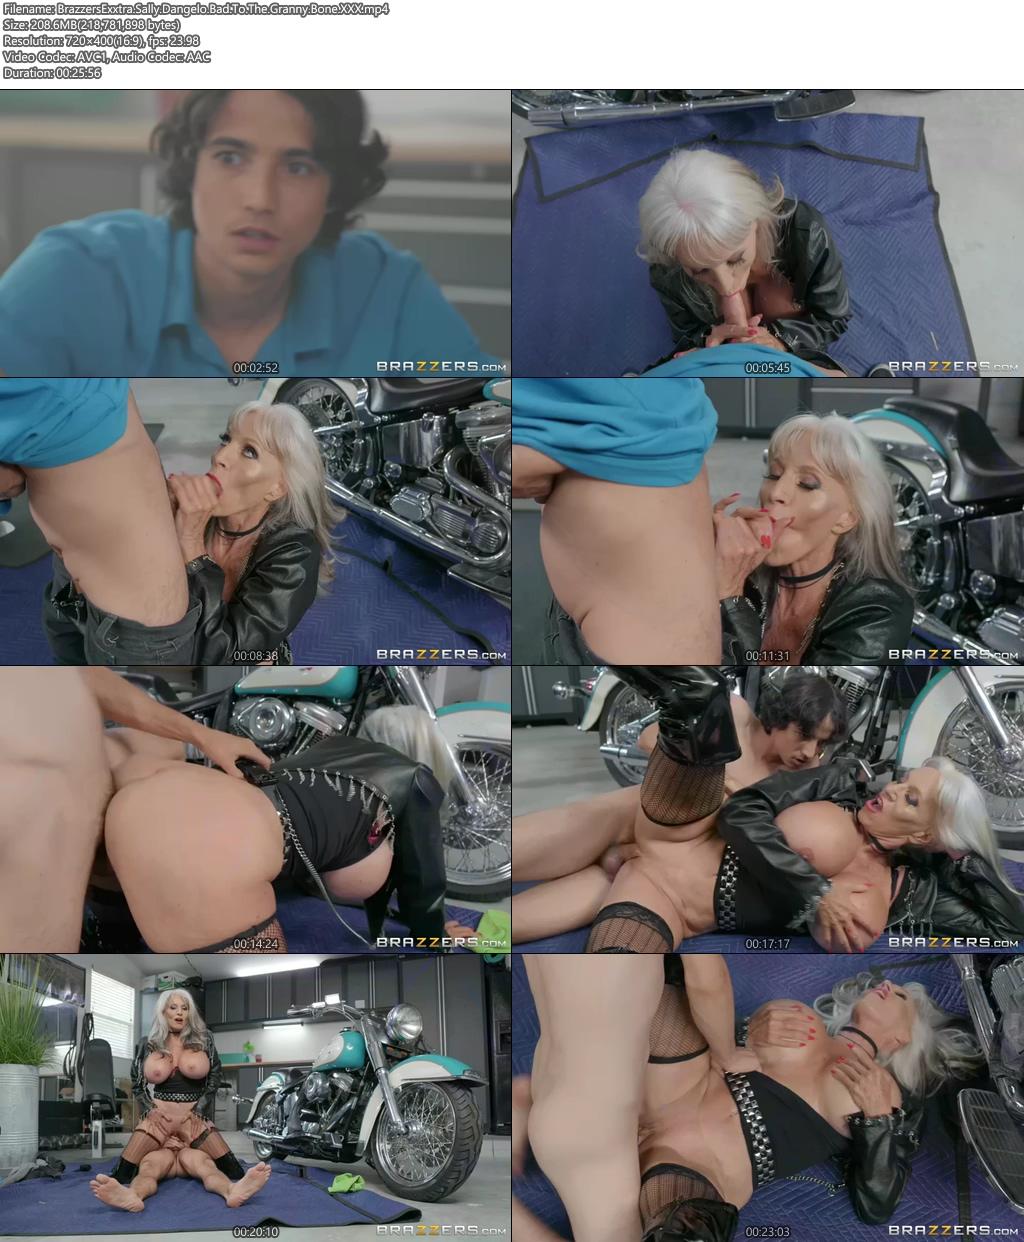 [18+] BrazzersExxtra Sally Dangelo Porn Video Bad To The Granny Bone XXX Screenshot